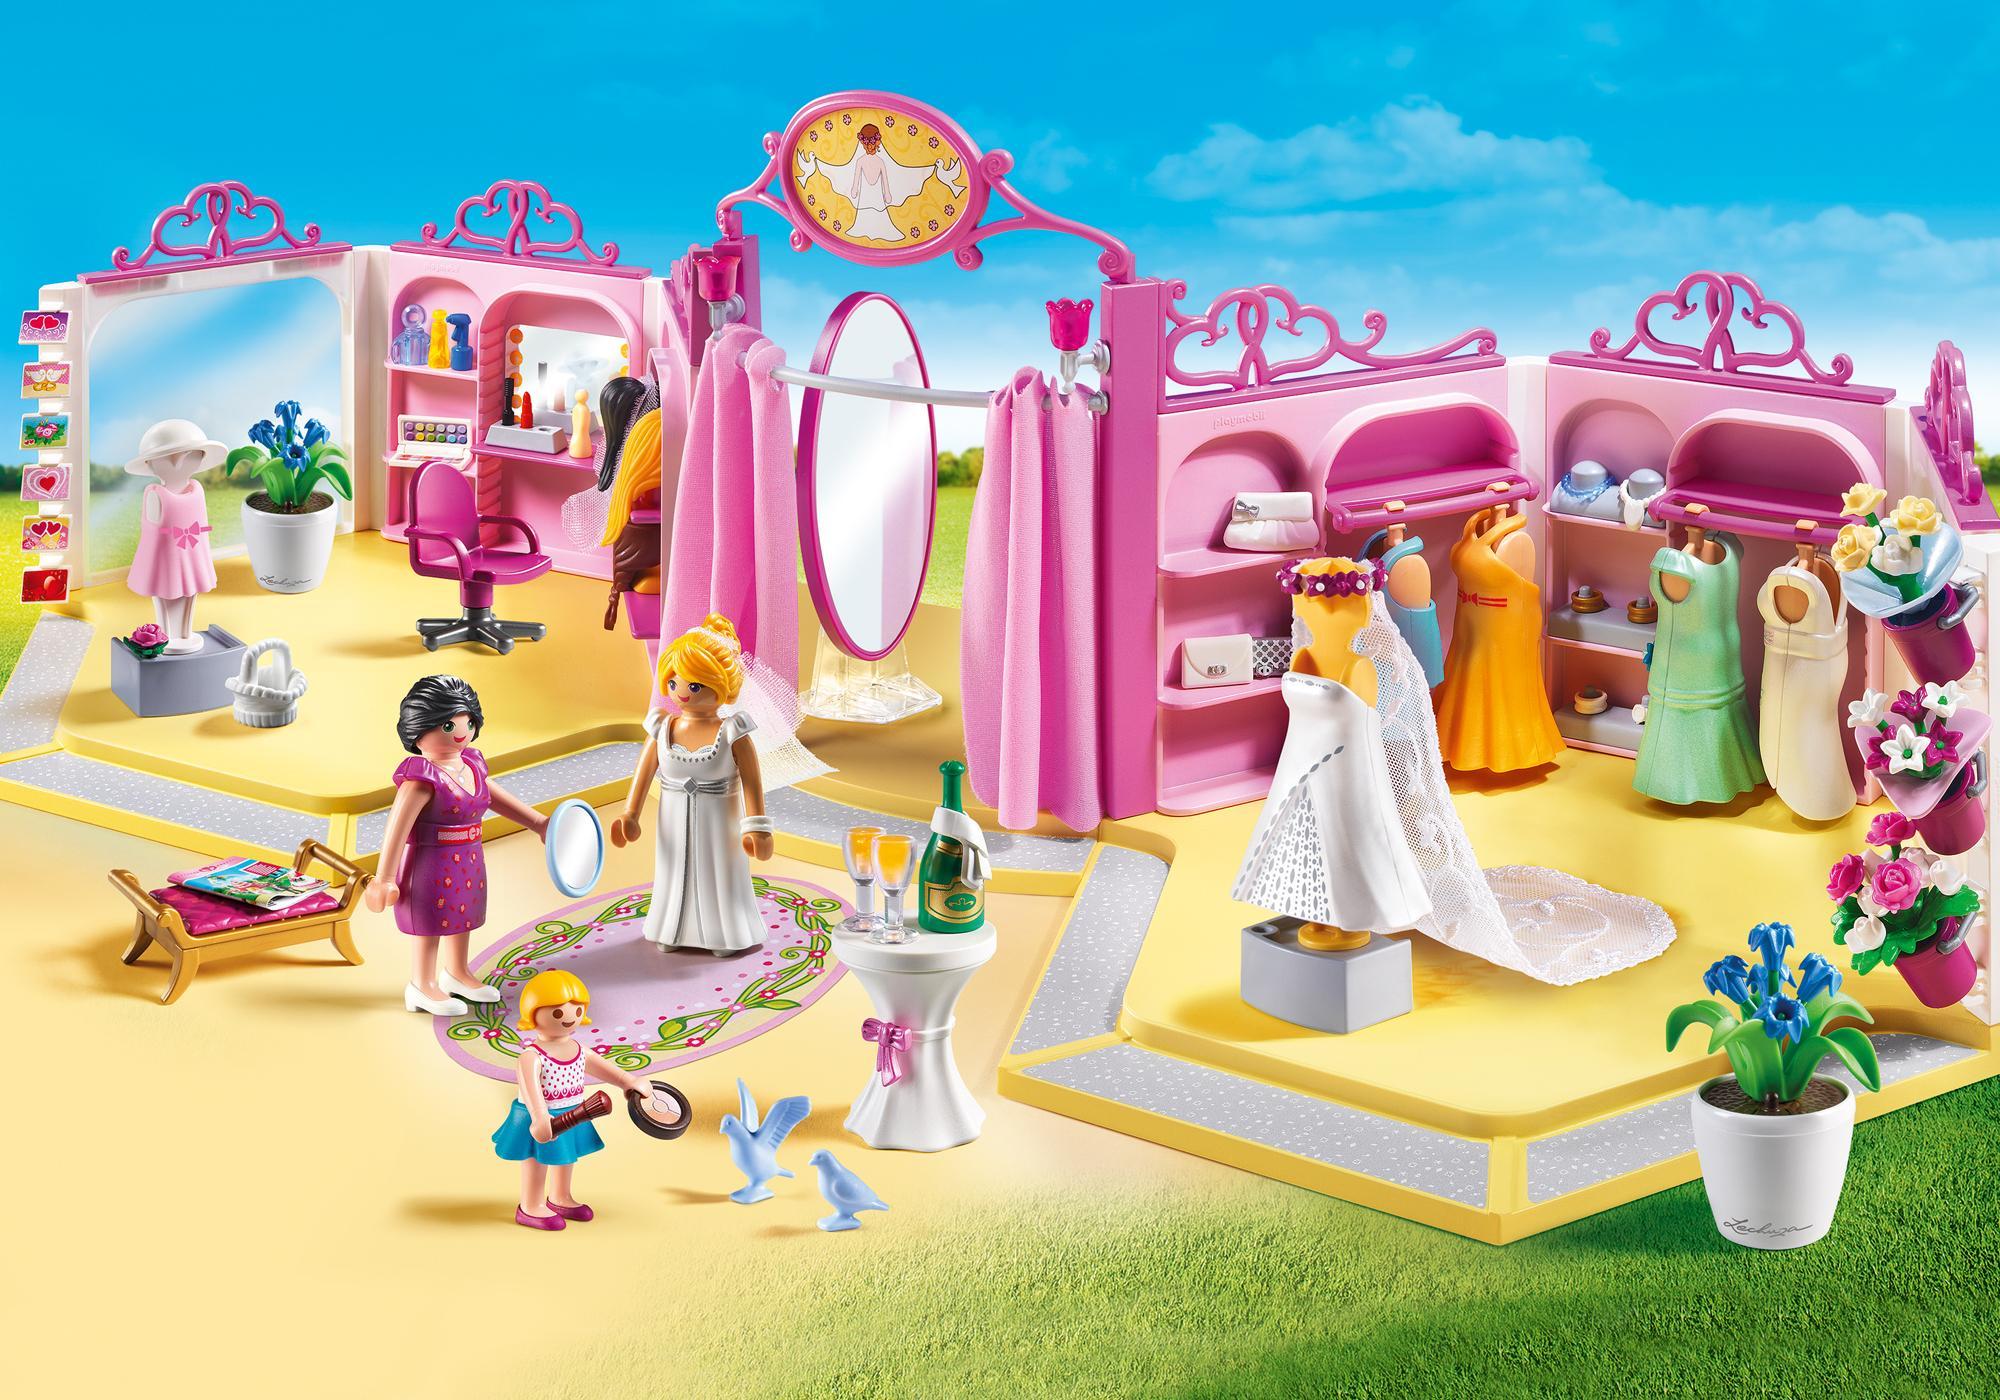 http://media.playmobil.com/i/playmobil/9226_product_detail/Κατάστημα νυφικών με σαλόνι ομορφιάς